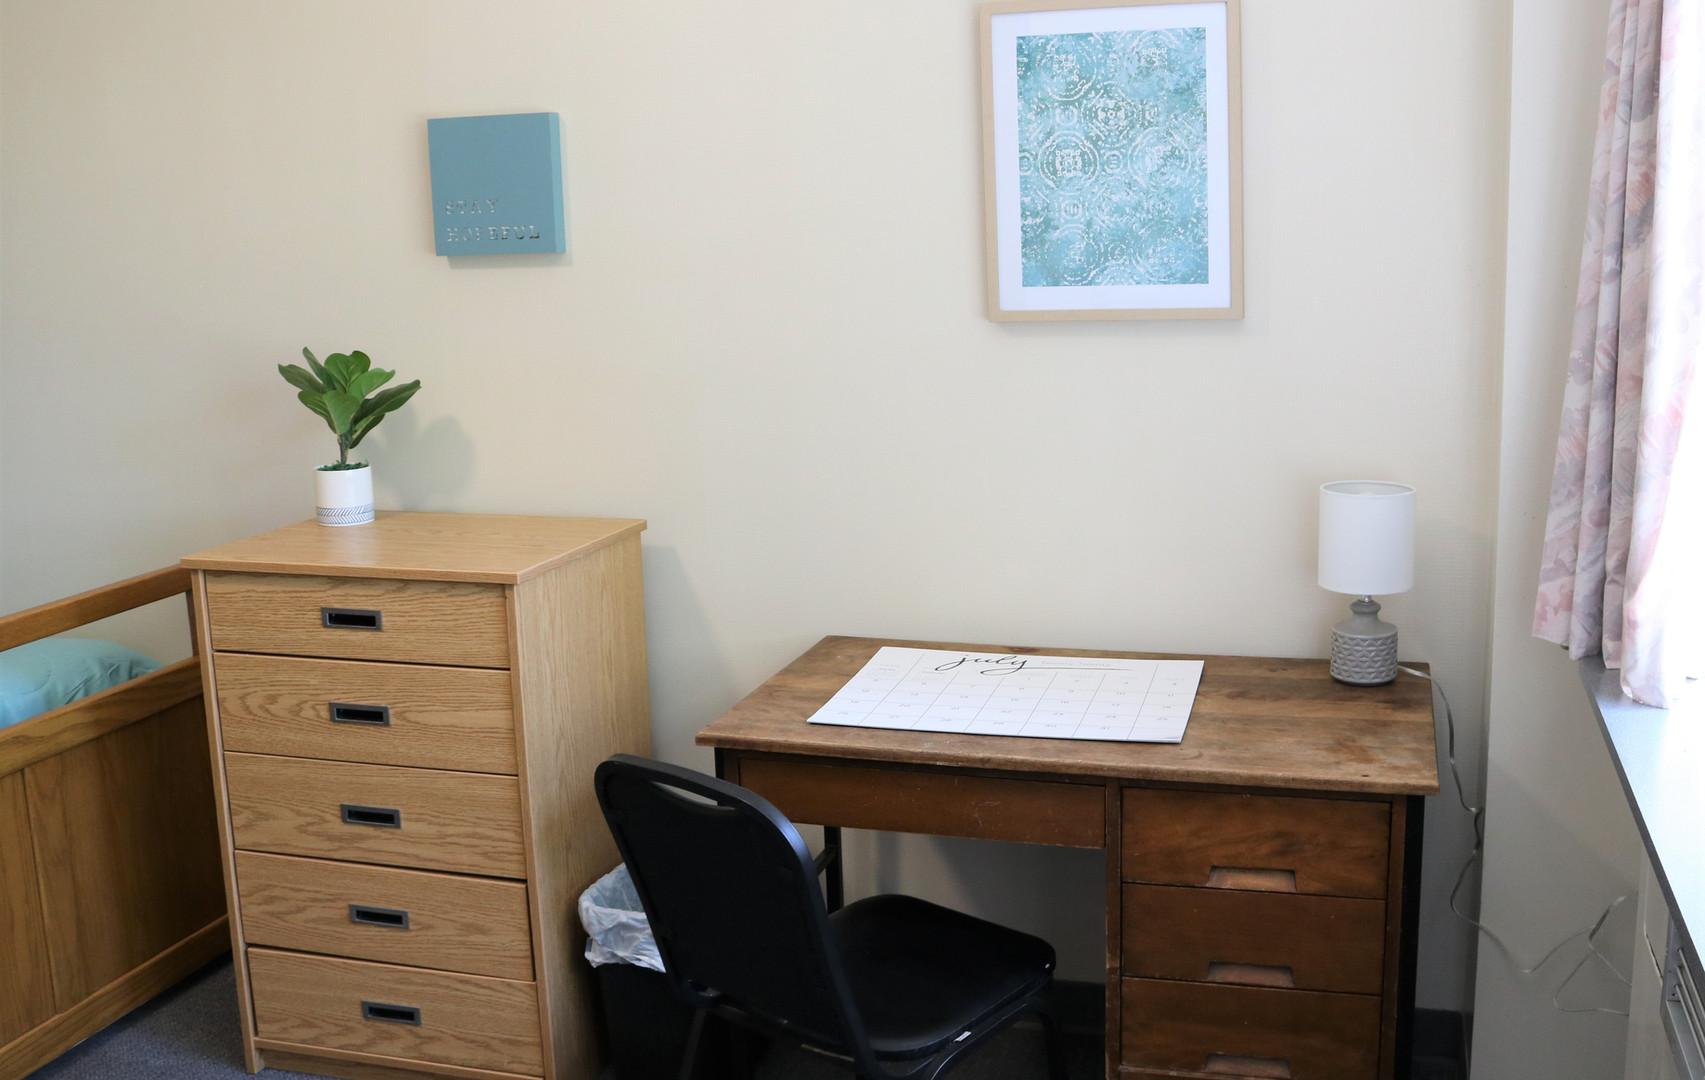 MHAB Dorm Room